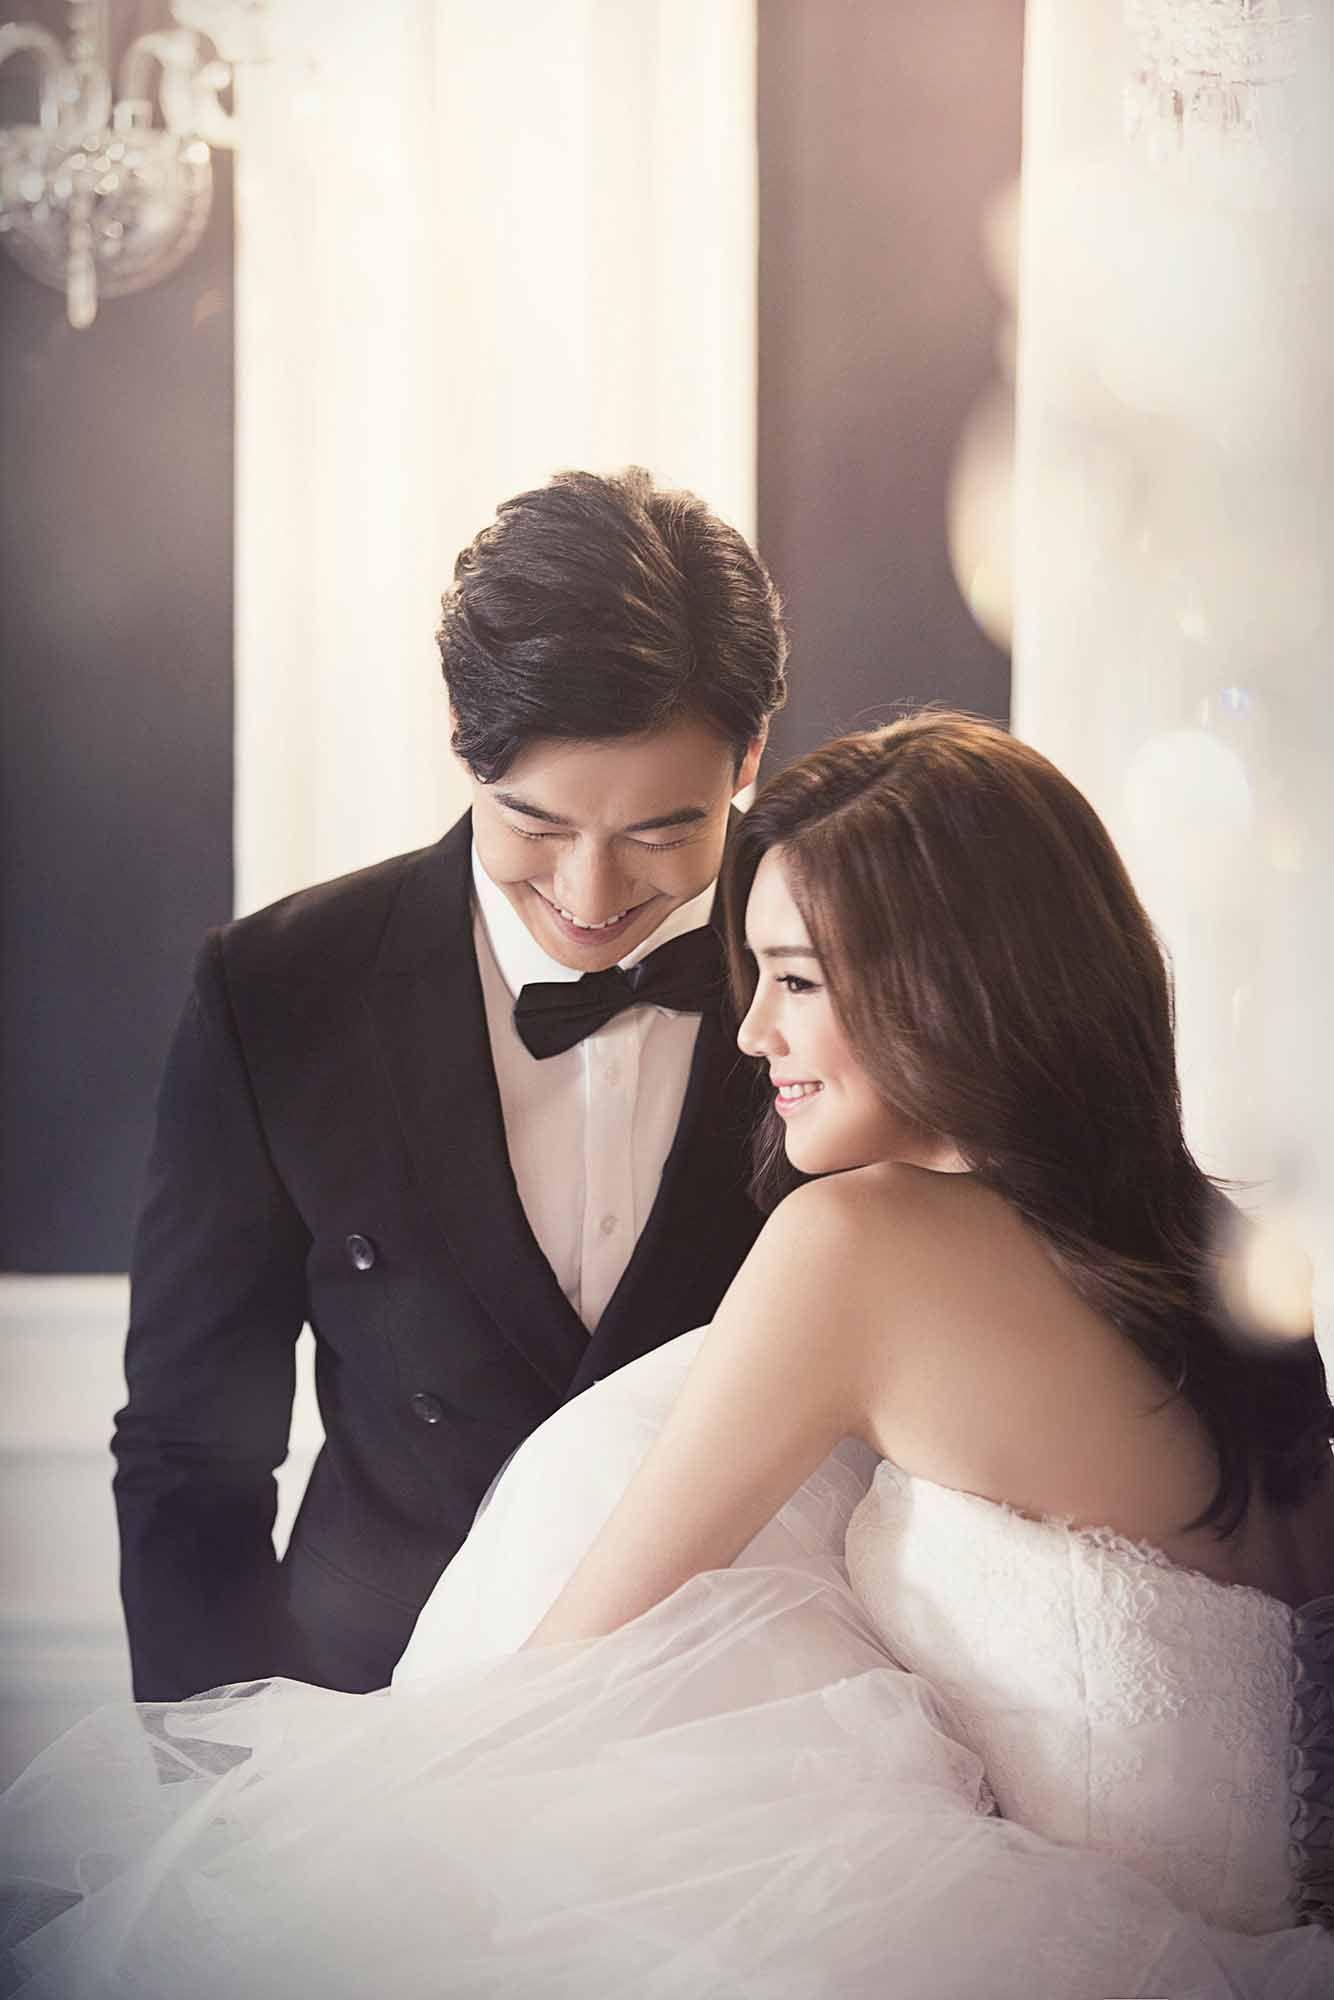 Korean Couple Wallpapers - Top Free Korean Couple Backgrounds -  WallpaperAccess